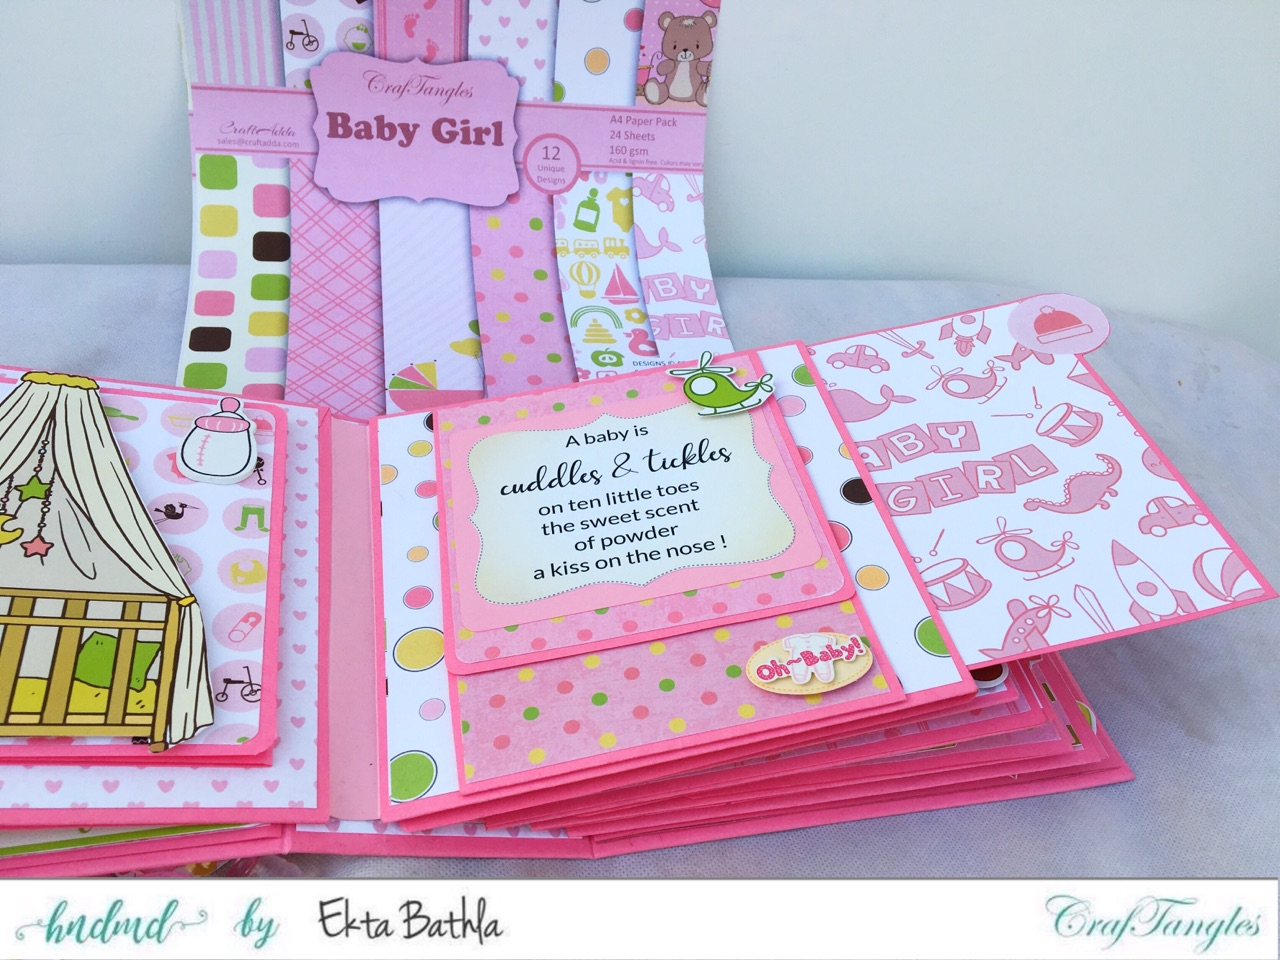 Baby Girl mini album showcasing Baby Girl Elements Pack by CrafTangles 7